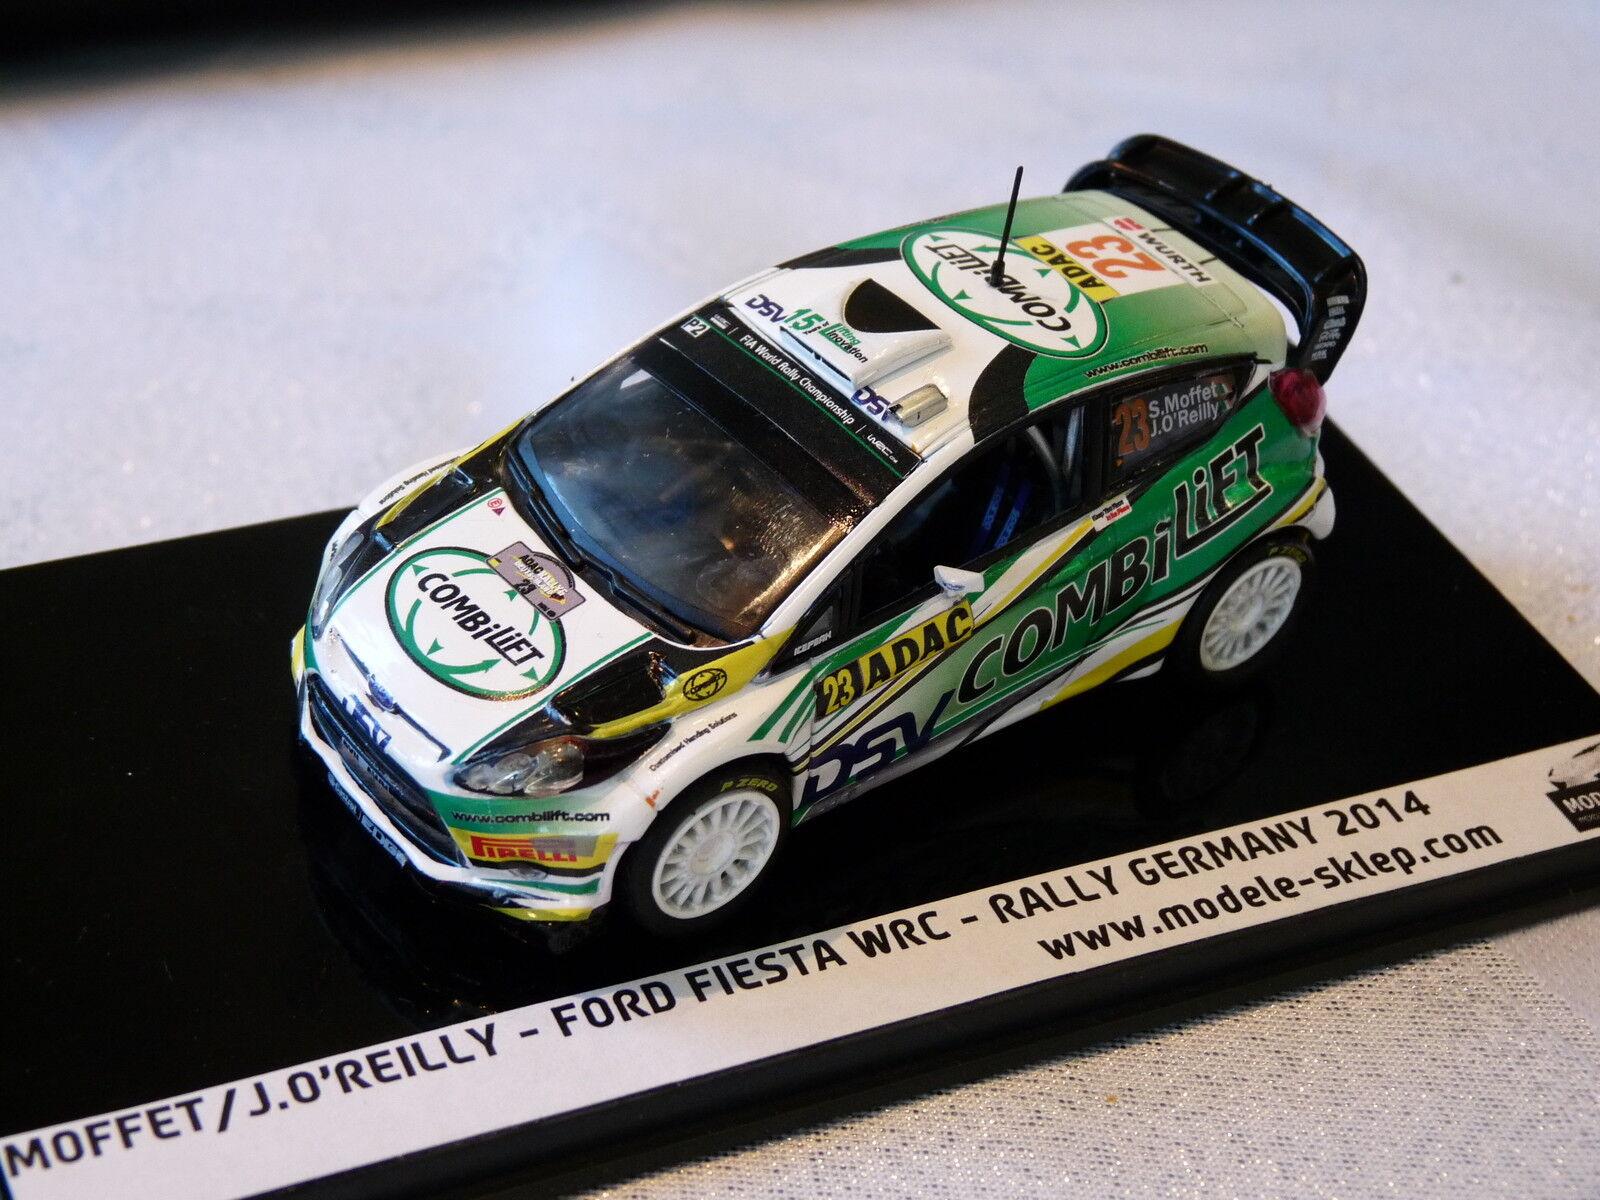 SAM MOFFETT  REILLY - FORD FIESTA WRC RALLY DEUTSCHLAND 2014  1 43 scale model